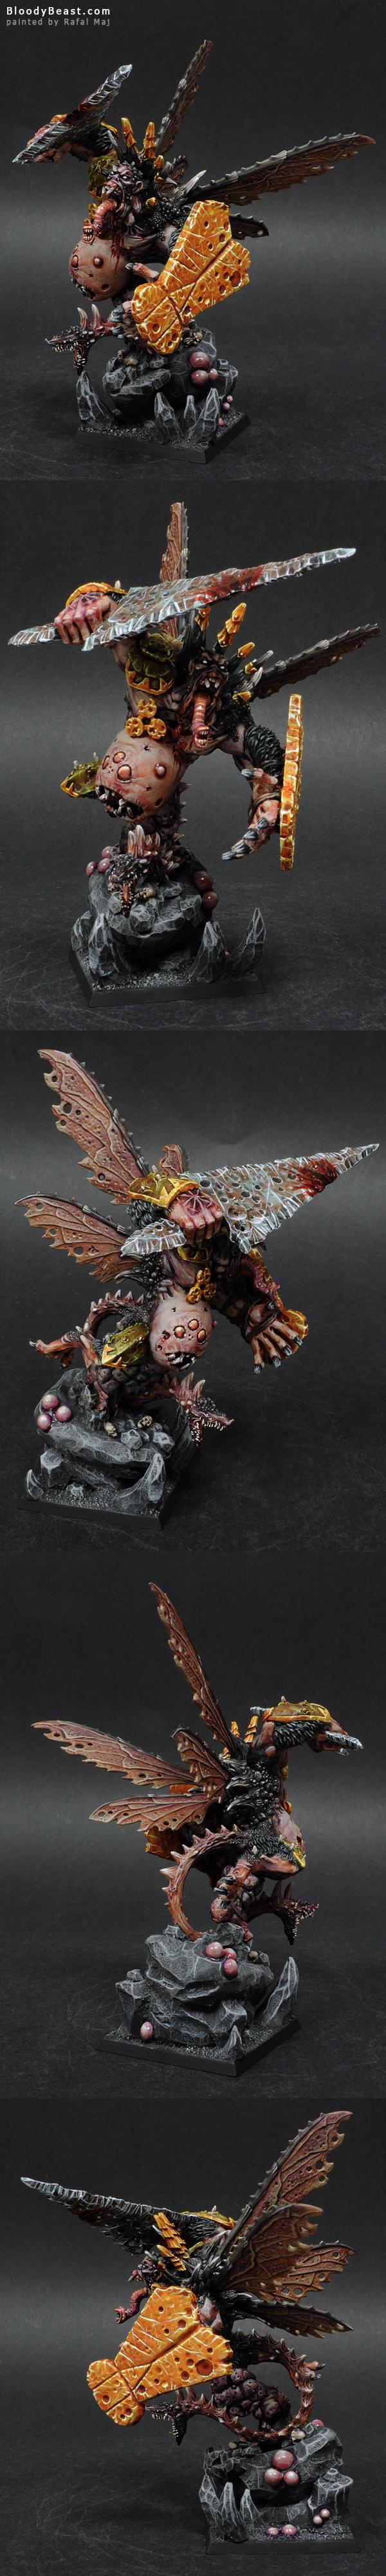 Daemon Prince of Nurgle Conversion painted by Rafal Maj (BloodyBeast.com)